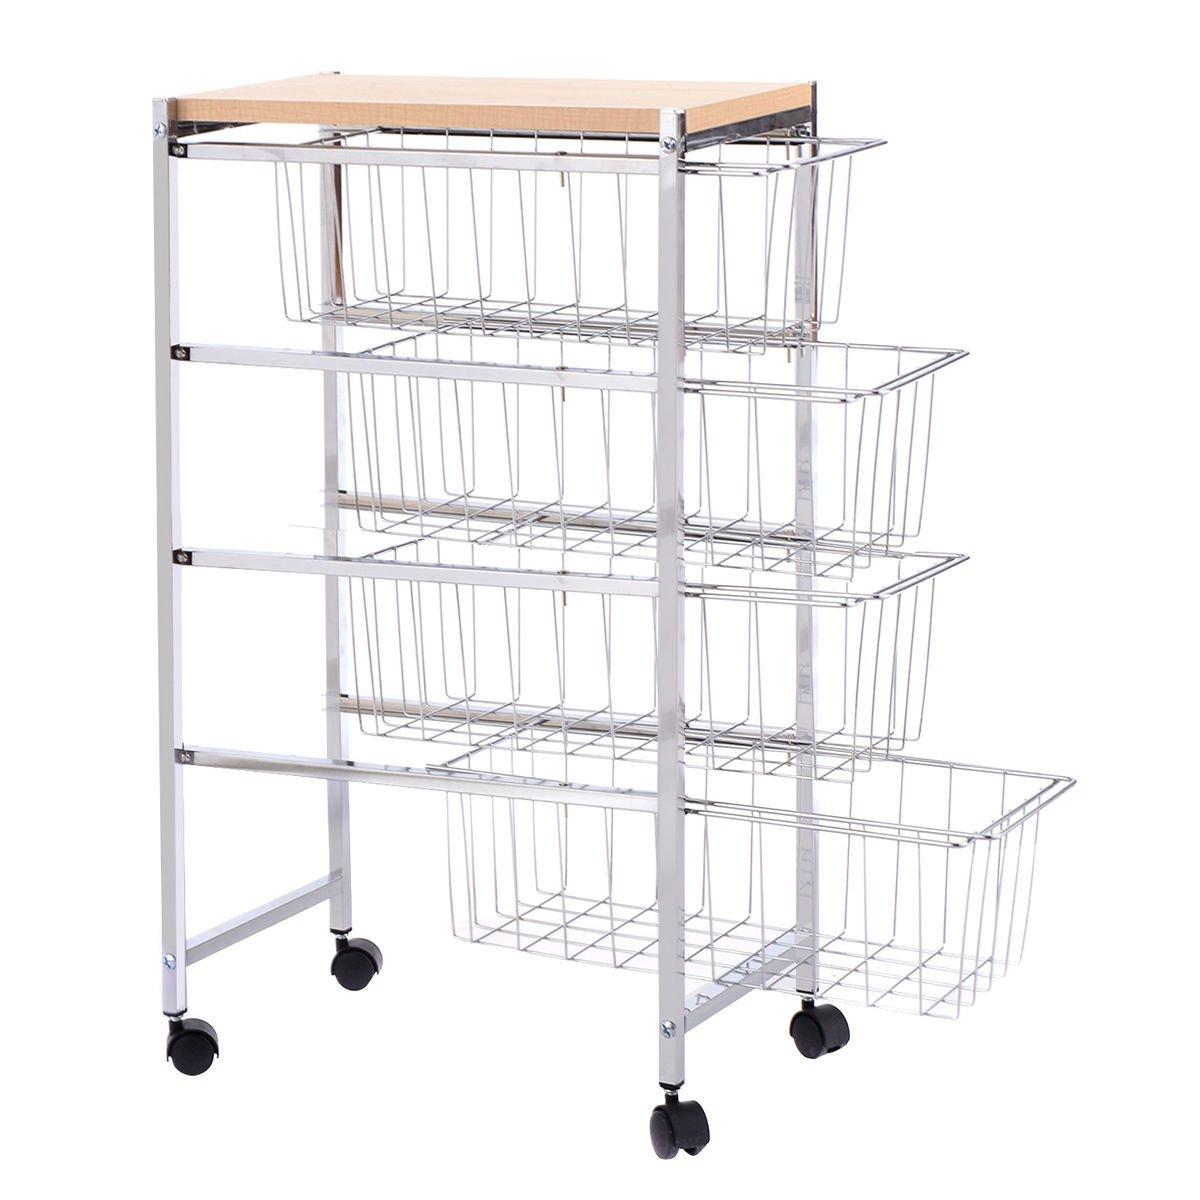 Trolley Cart 4 Tiers Baskets Rack Storage Rolling Home Kitchen Garage Wood Top